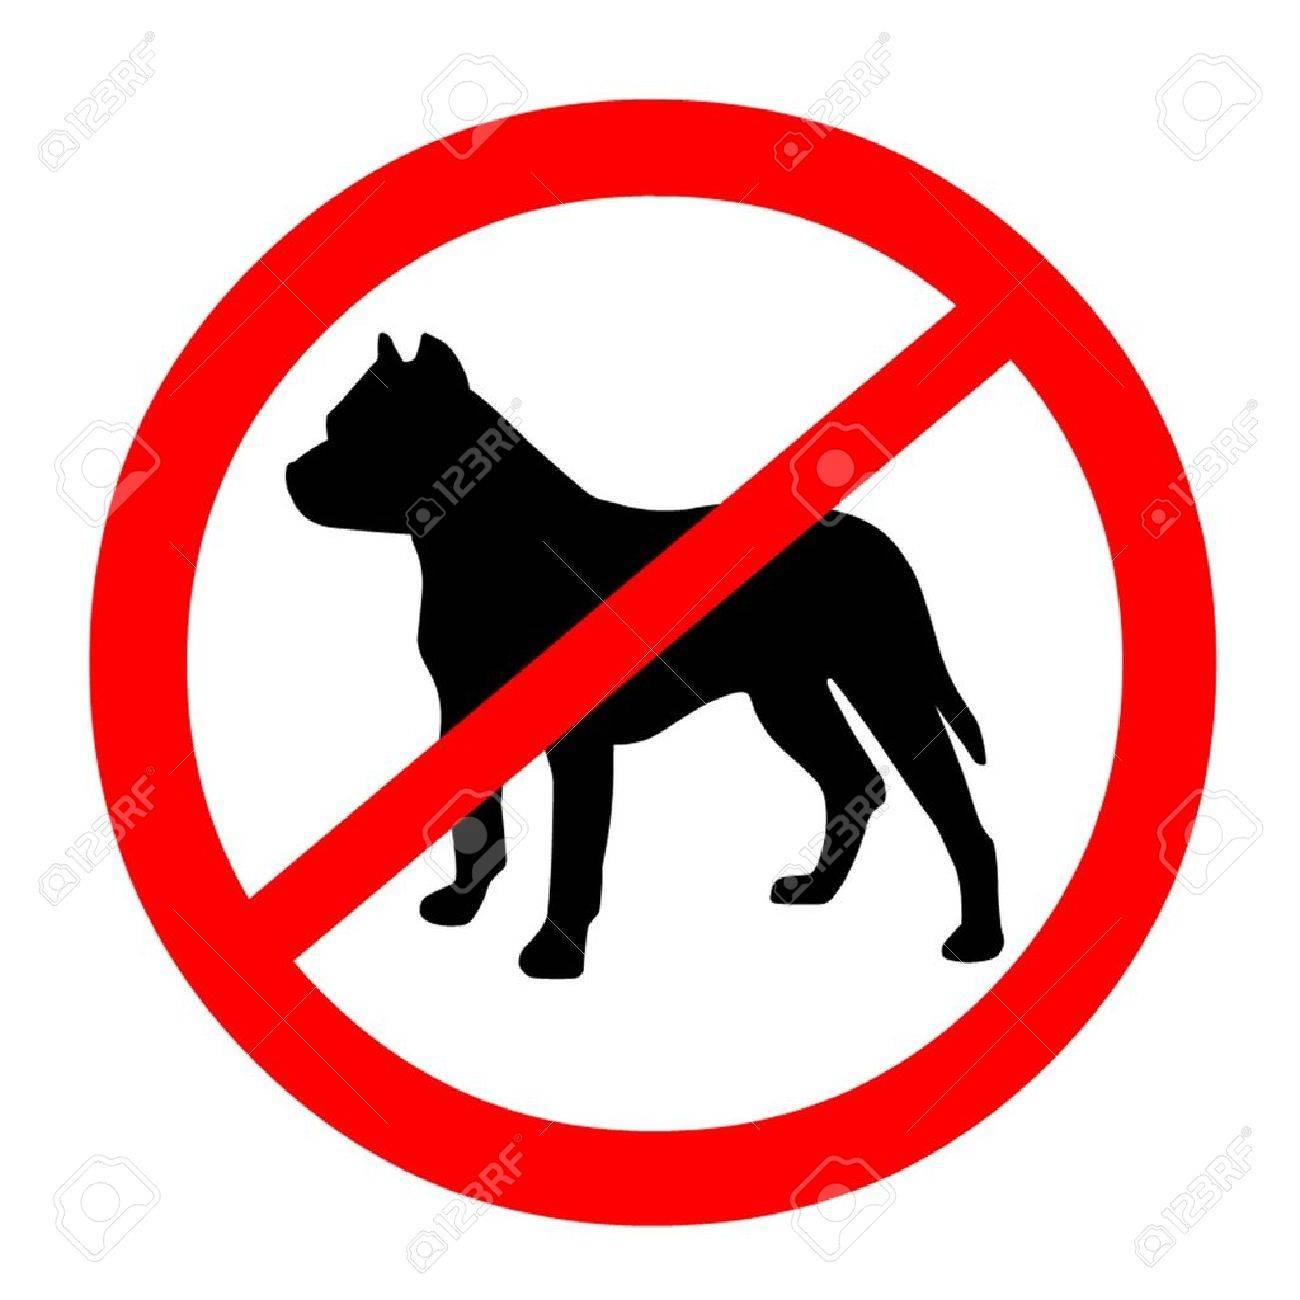 Pitbull Ban - Dangerous Dogs Act Royalty Free Cliparts, Vectors ...